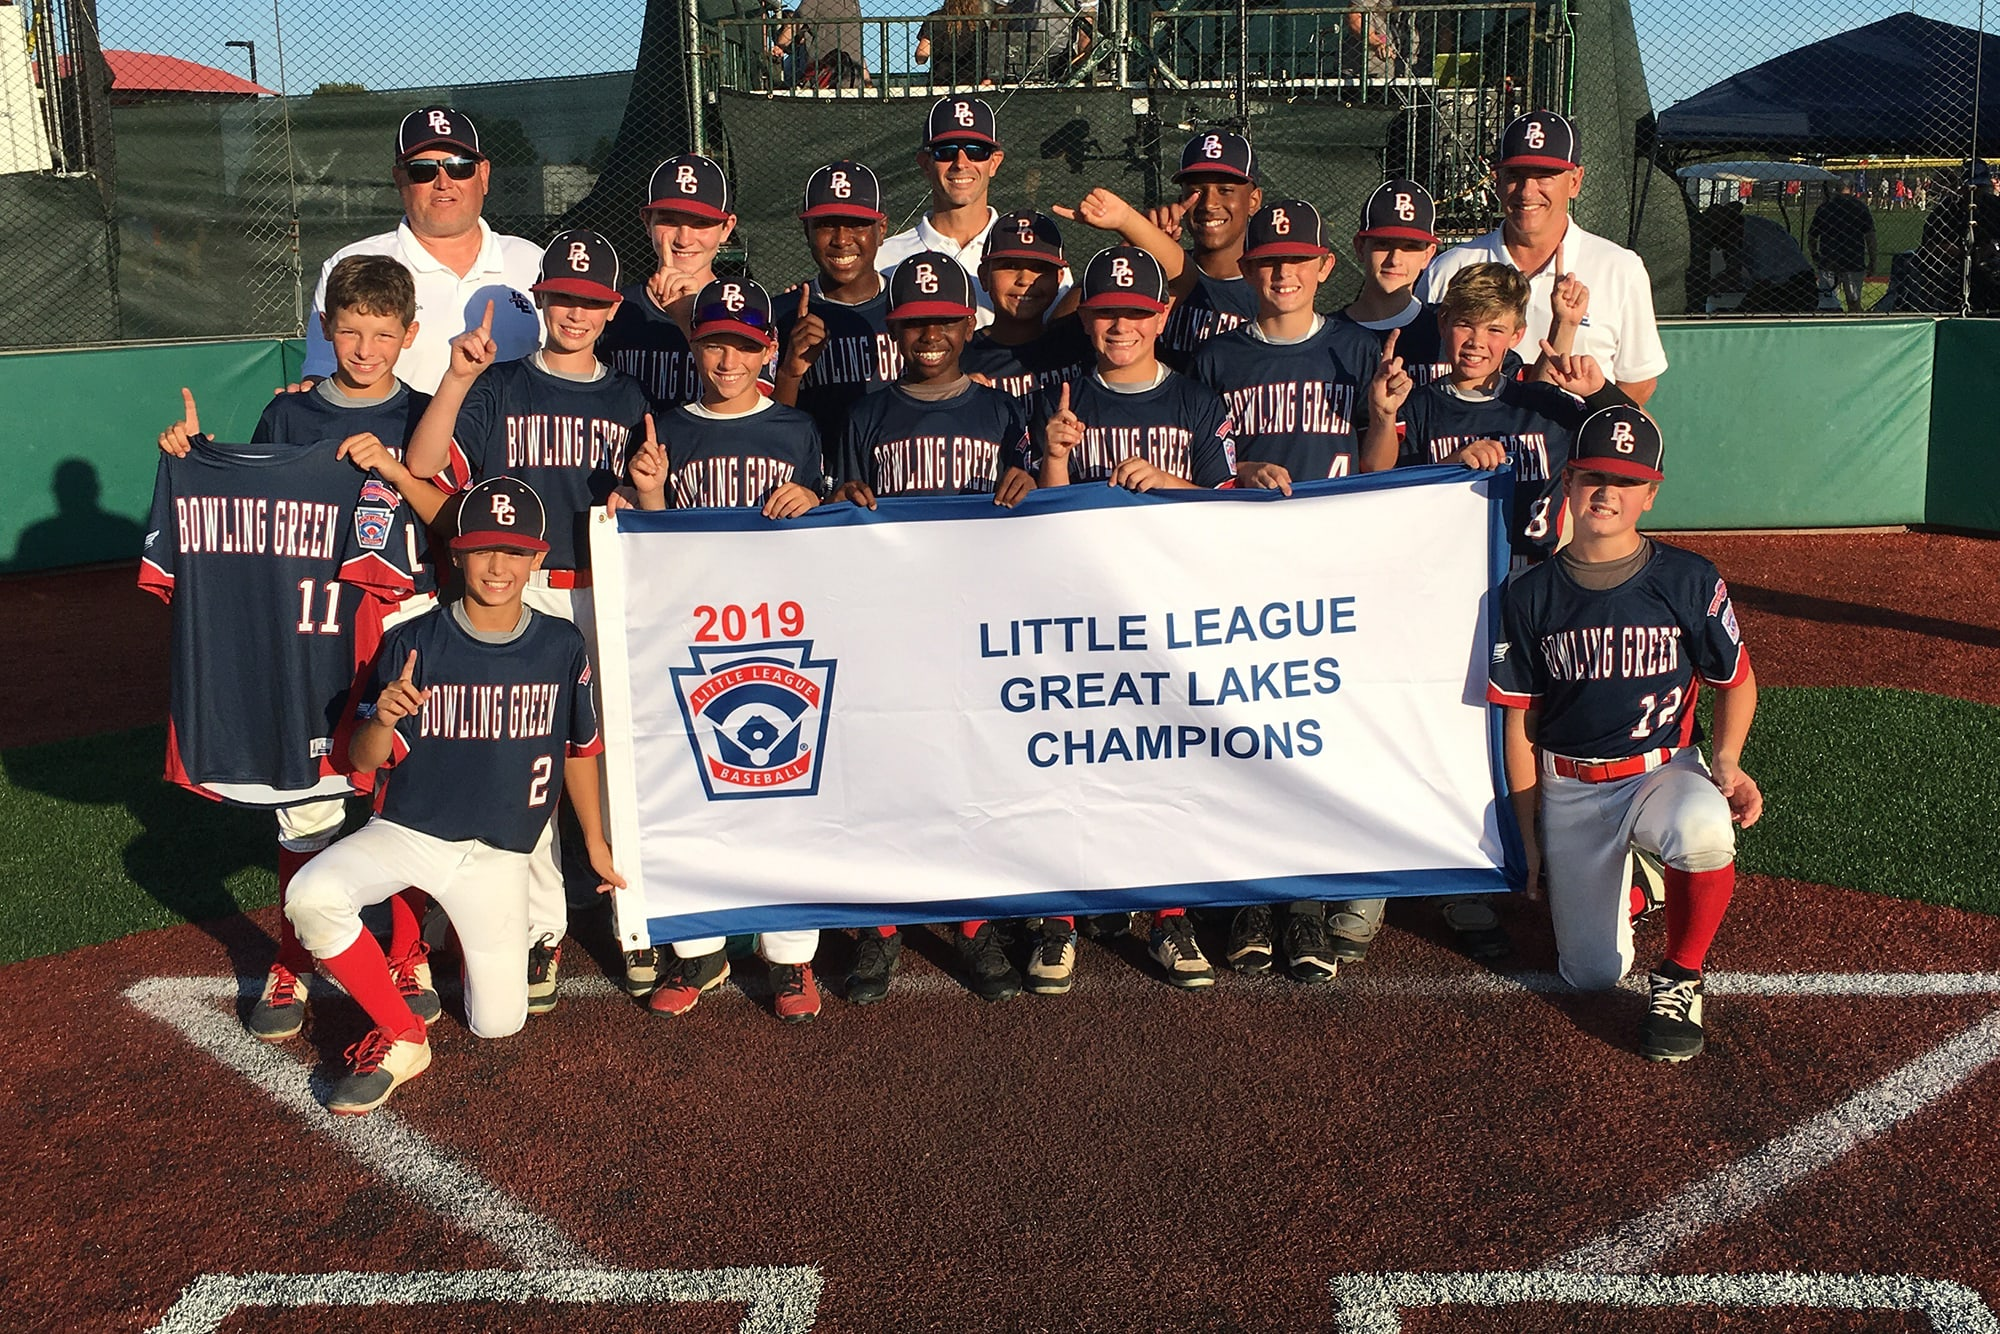 2019 LLB Great Lakes Region Champions